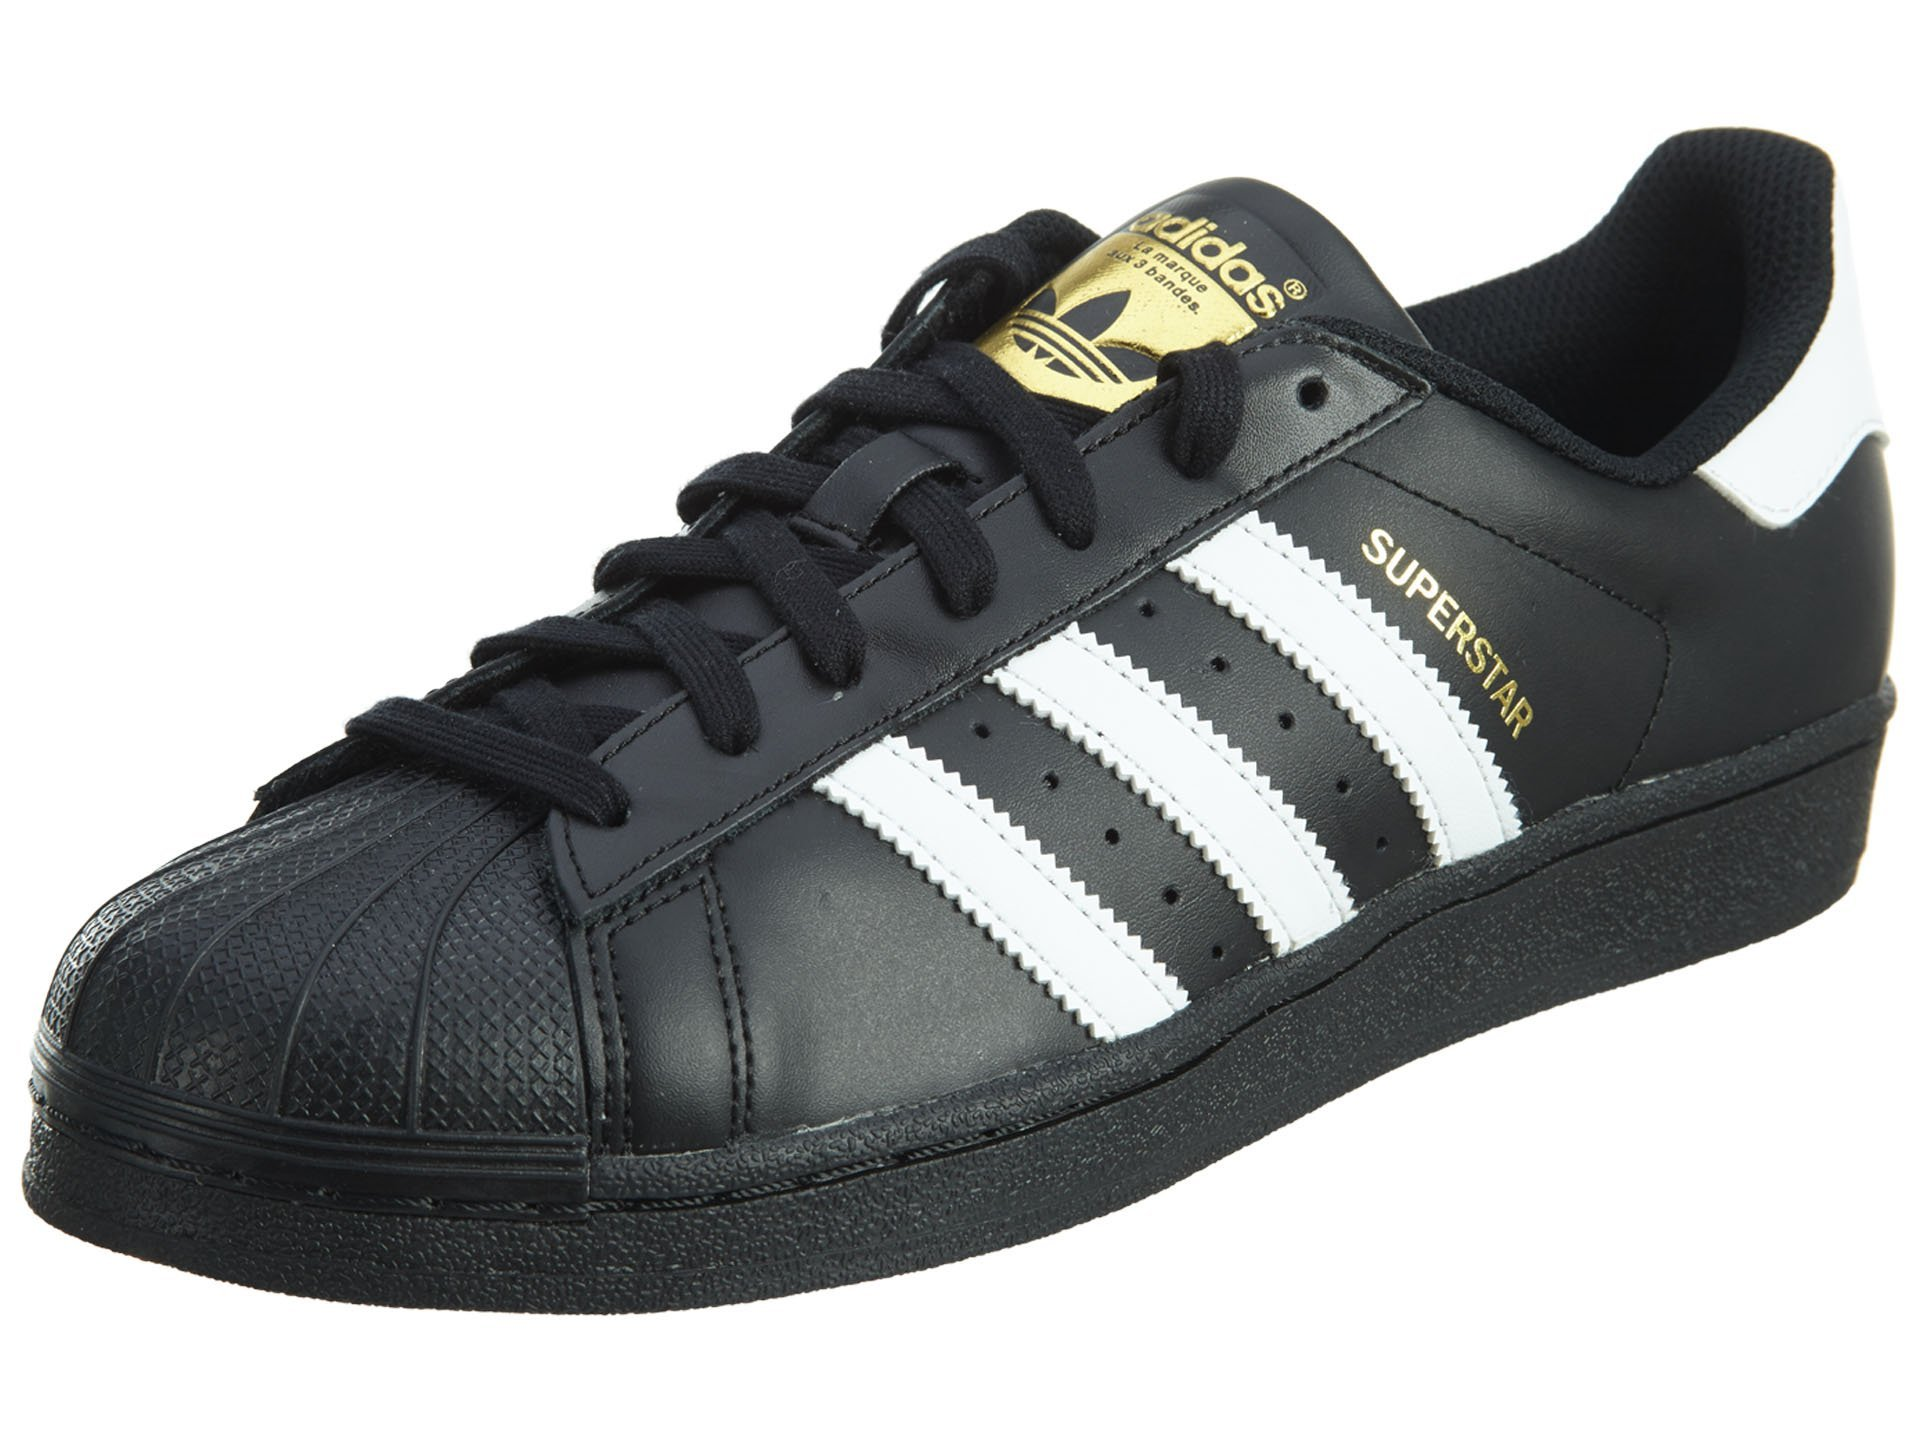 adidas Originals Men's Superstar Foundation Casual Sneaker, Black/White/Black, 4 D(M) US